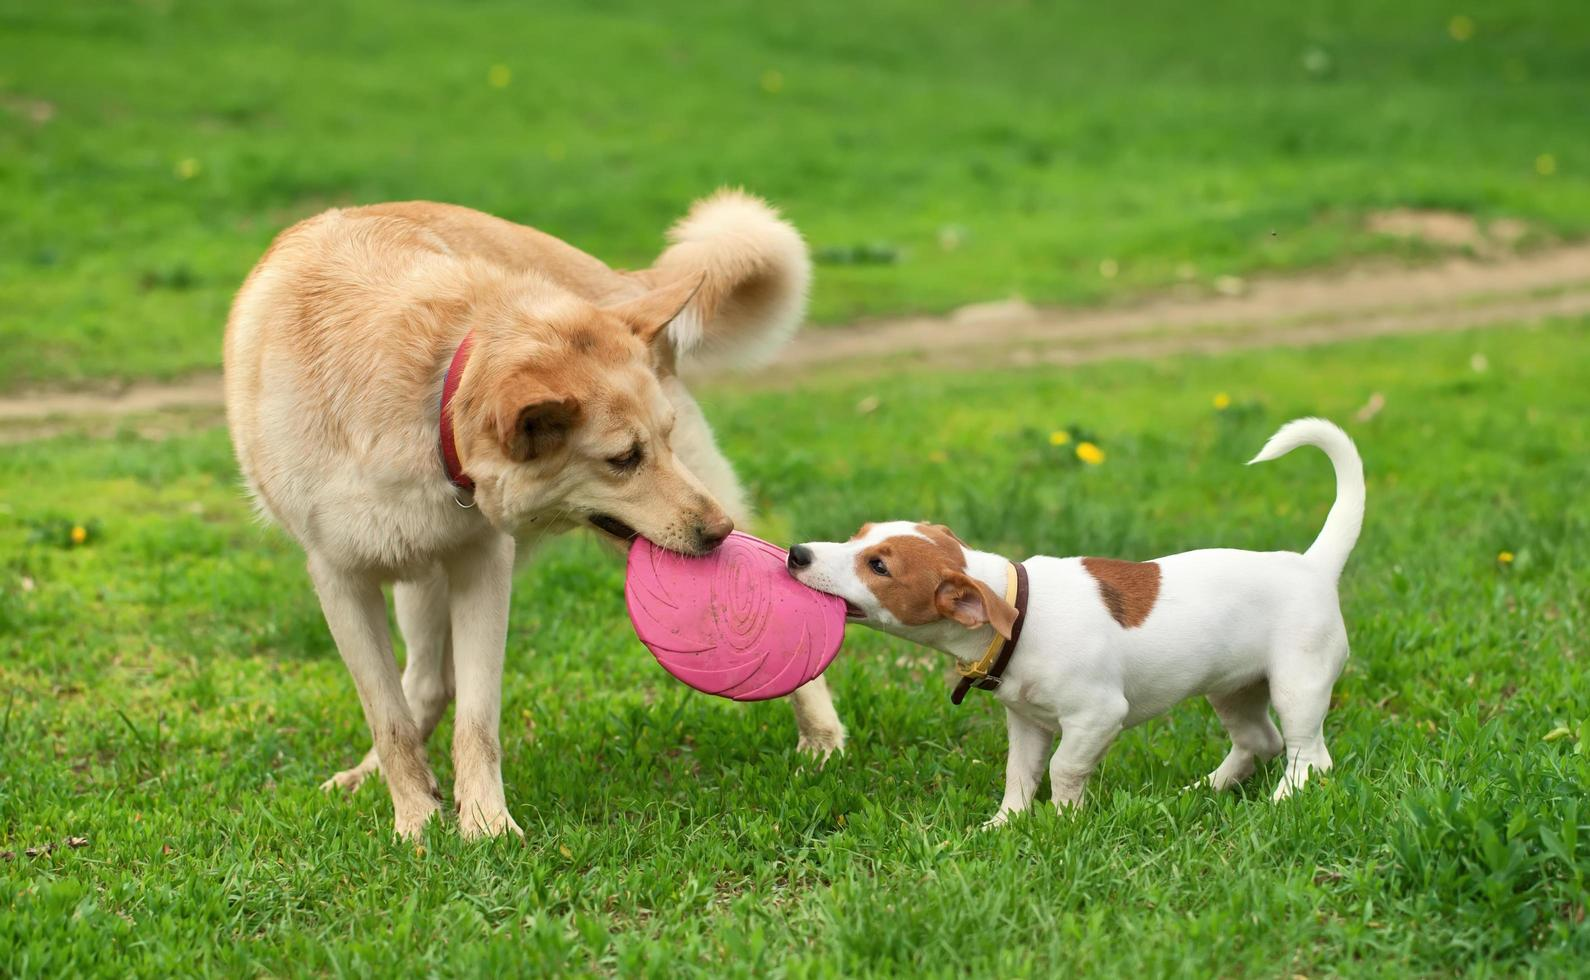 perros llevan frisbee rosa foto